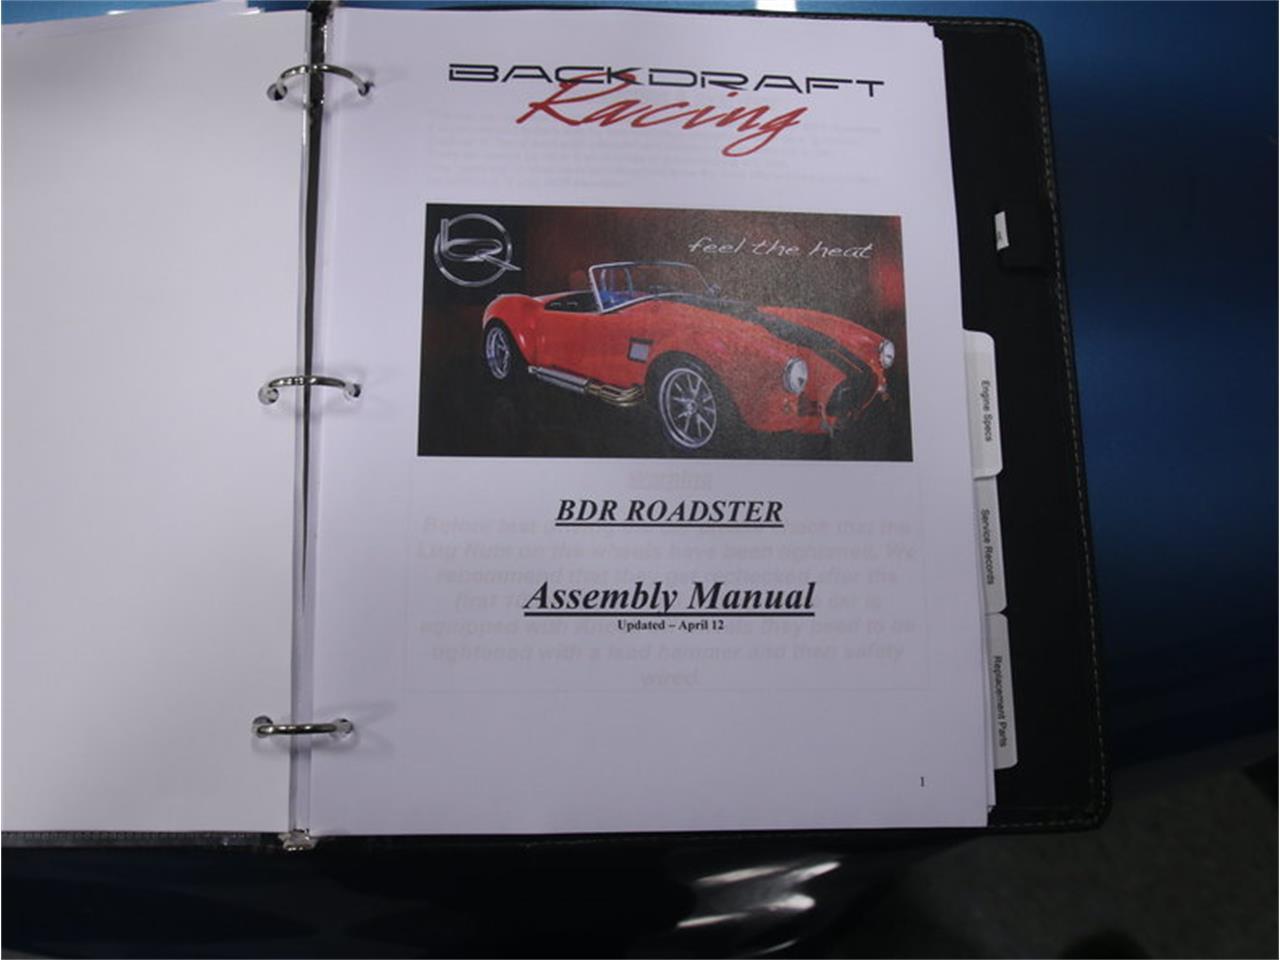 Large Picture of '65 Backdraft Racing Cobra - $59,995.00 - M9QO